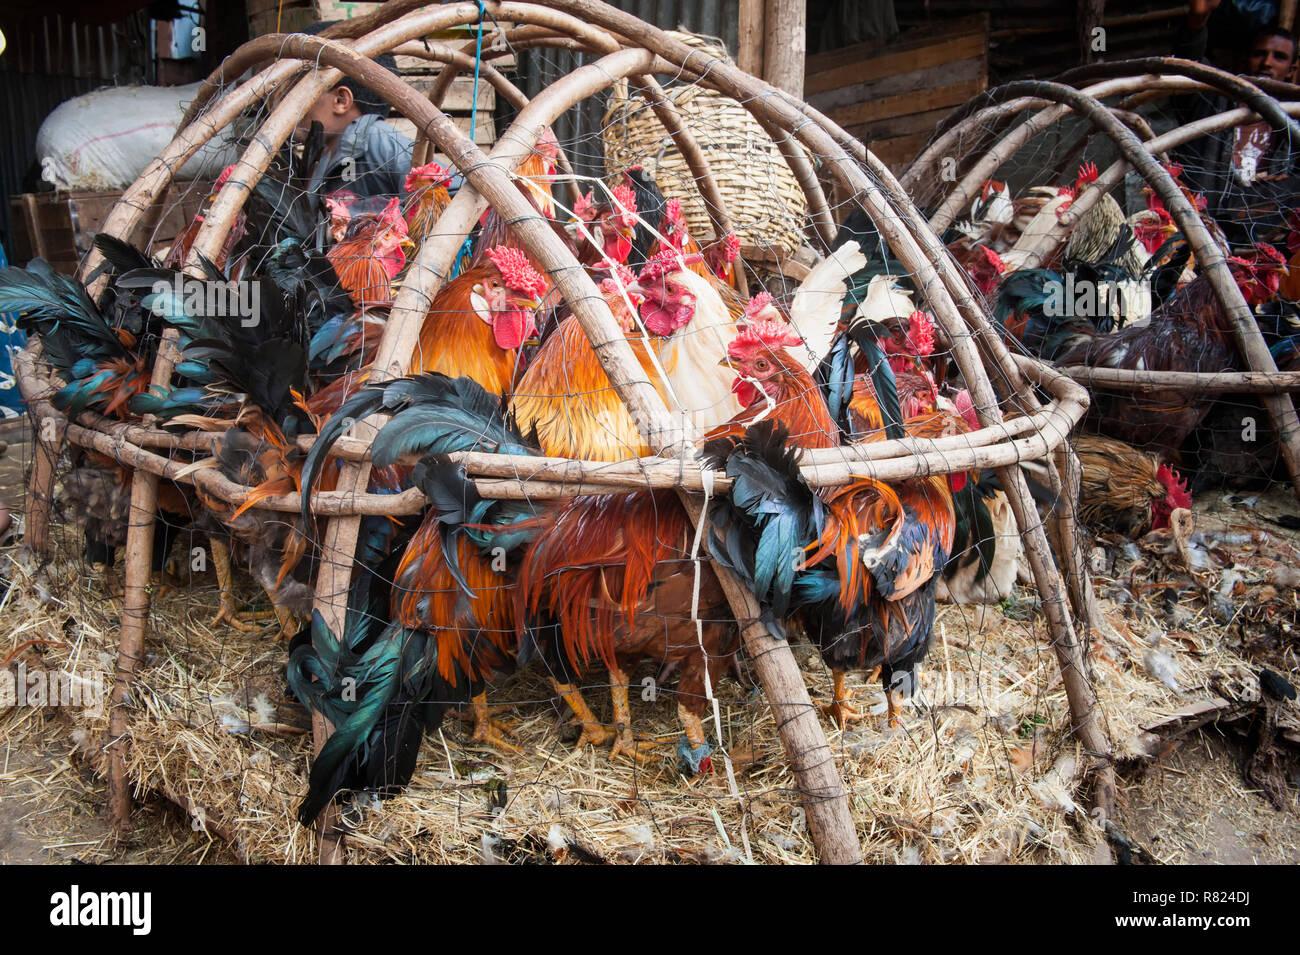 Chickens in a basket, market street scene, Mercato of Addis Ababa, Addis Ababa, Oromia Region, Ethiopia - Stock Image